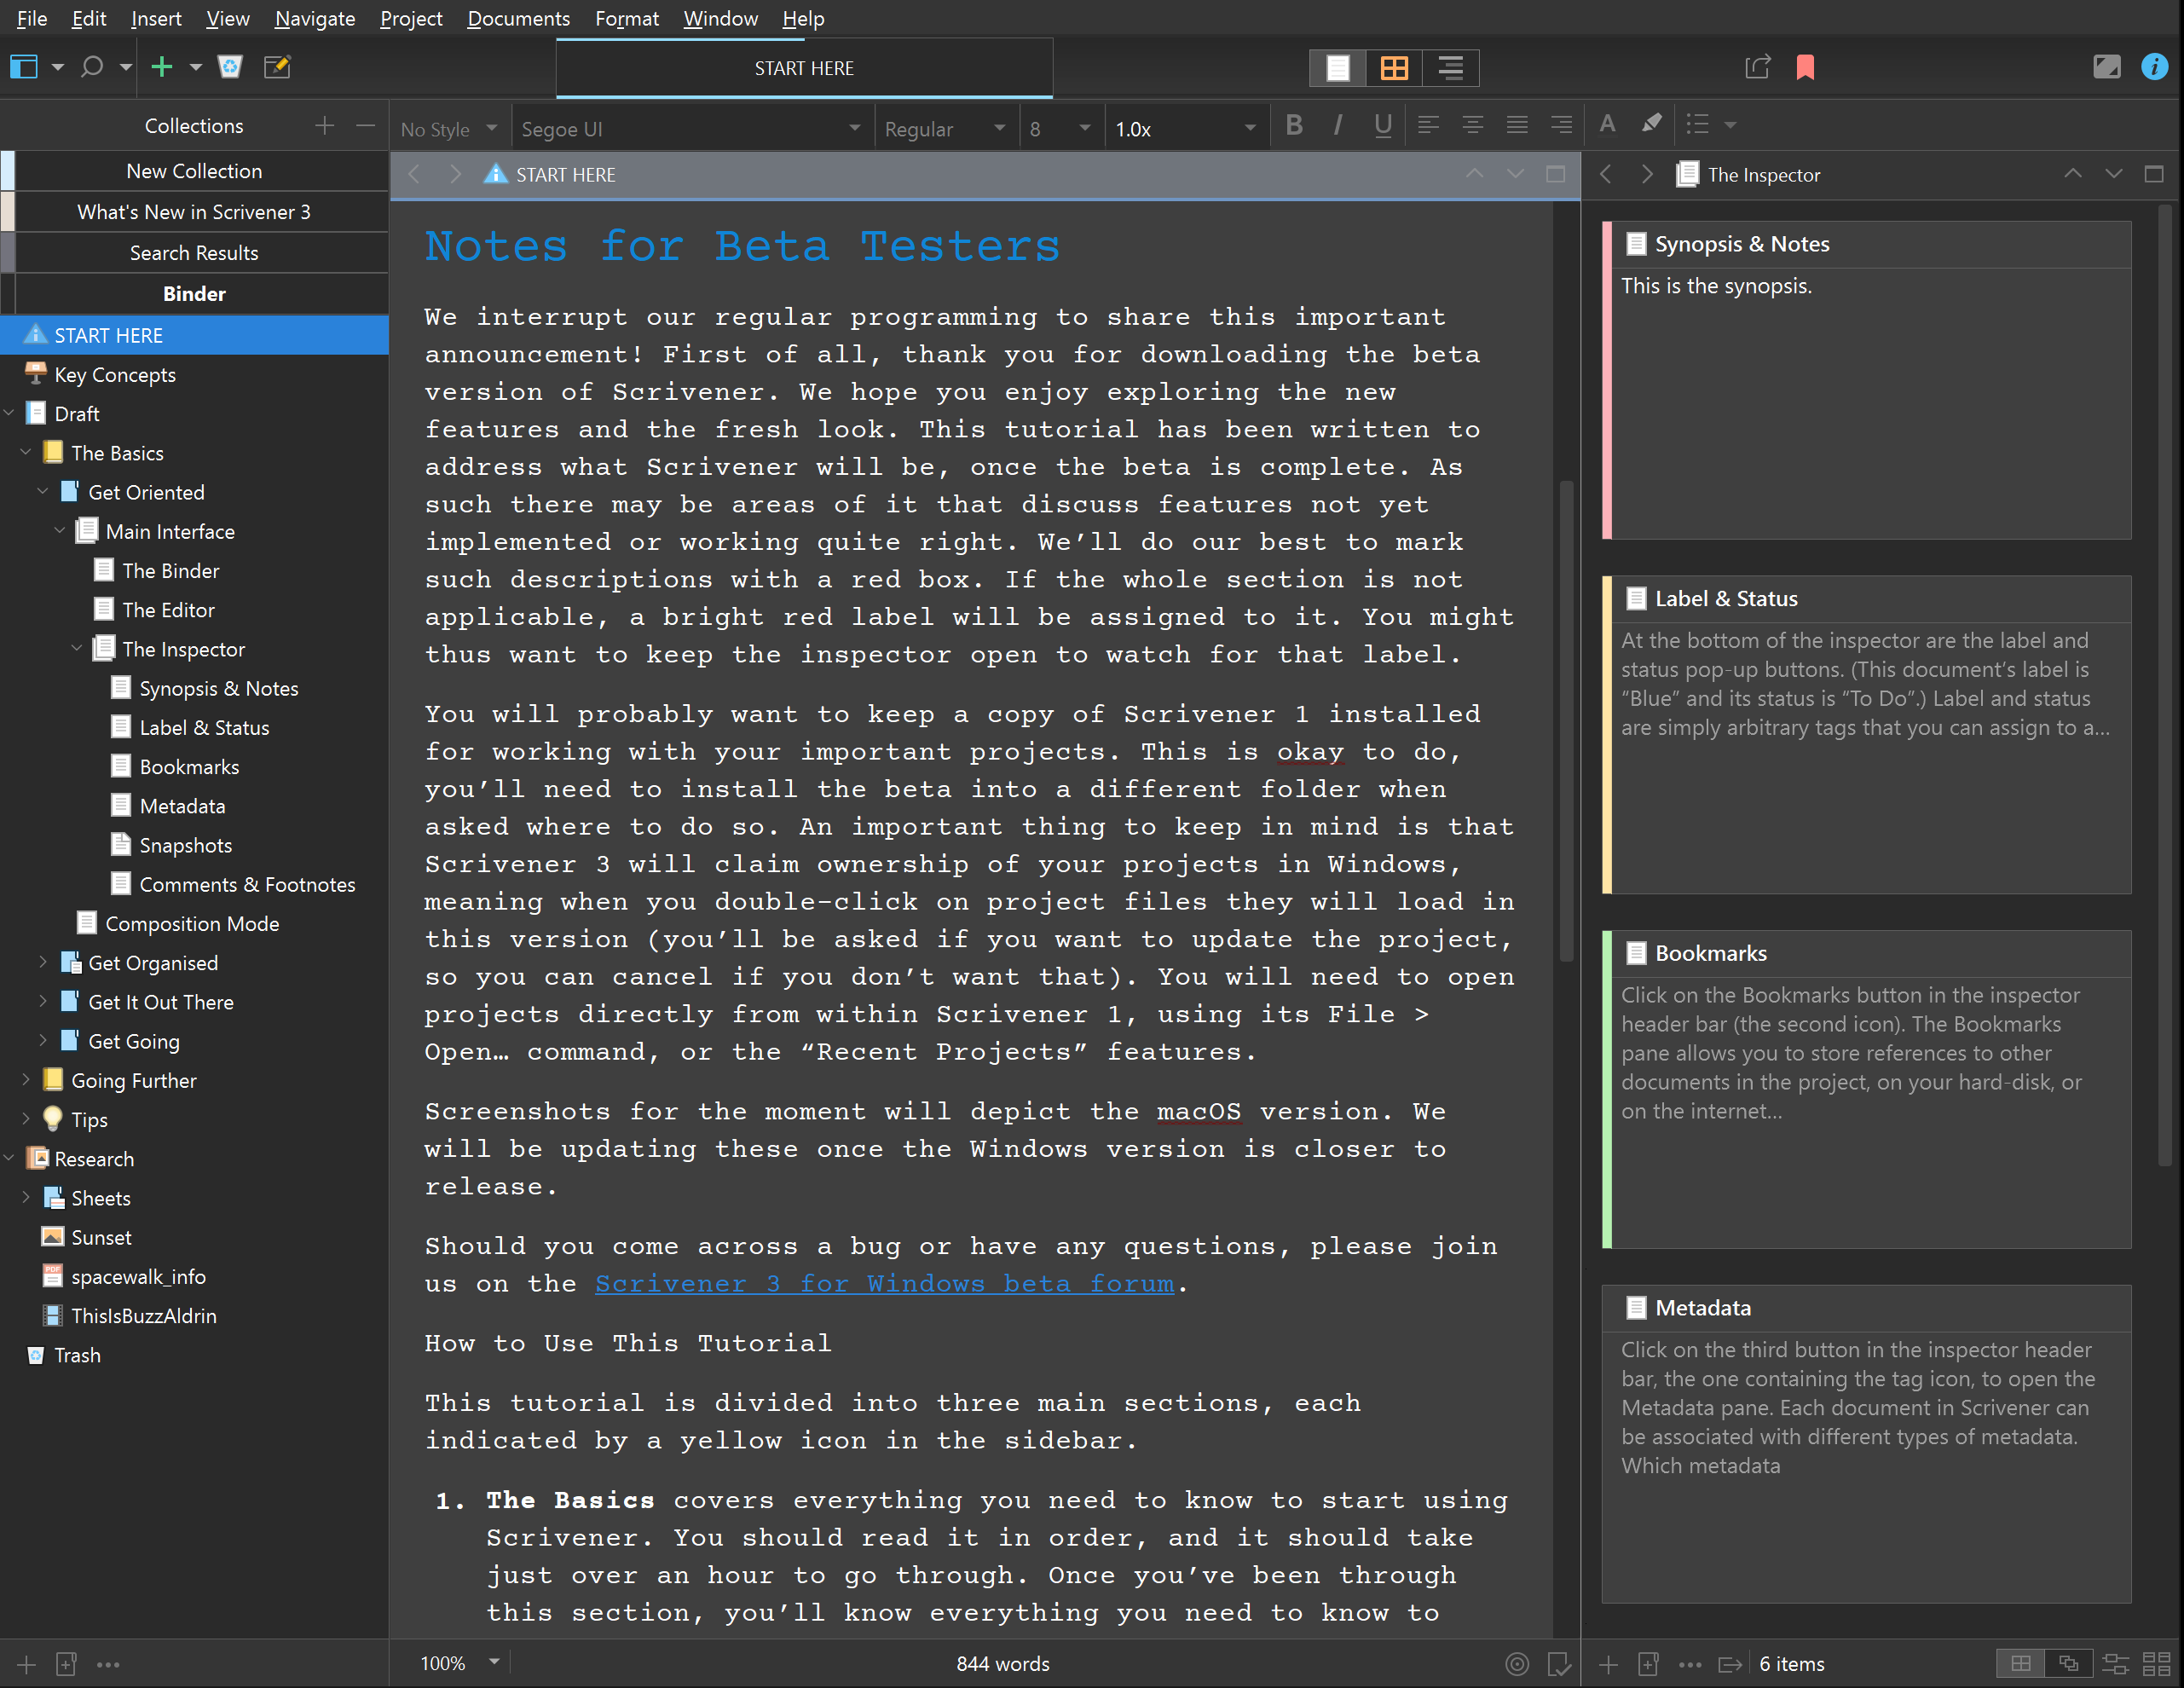 Scrivener 3 for Windows - Dark Mode